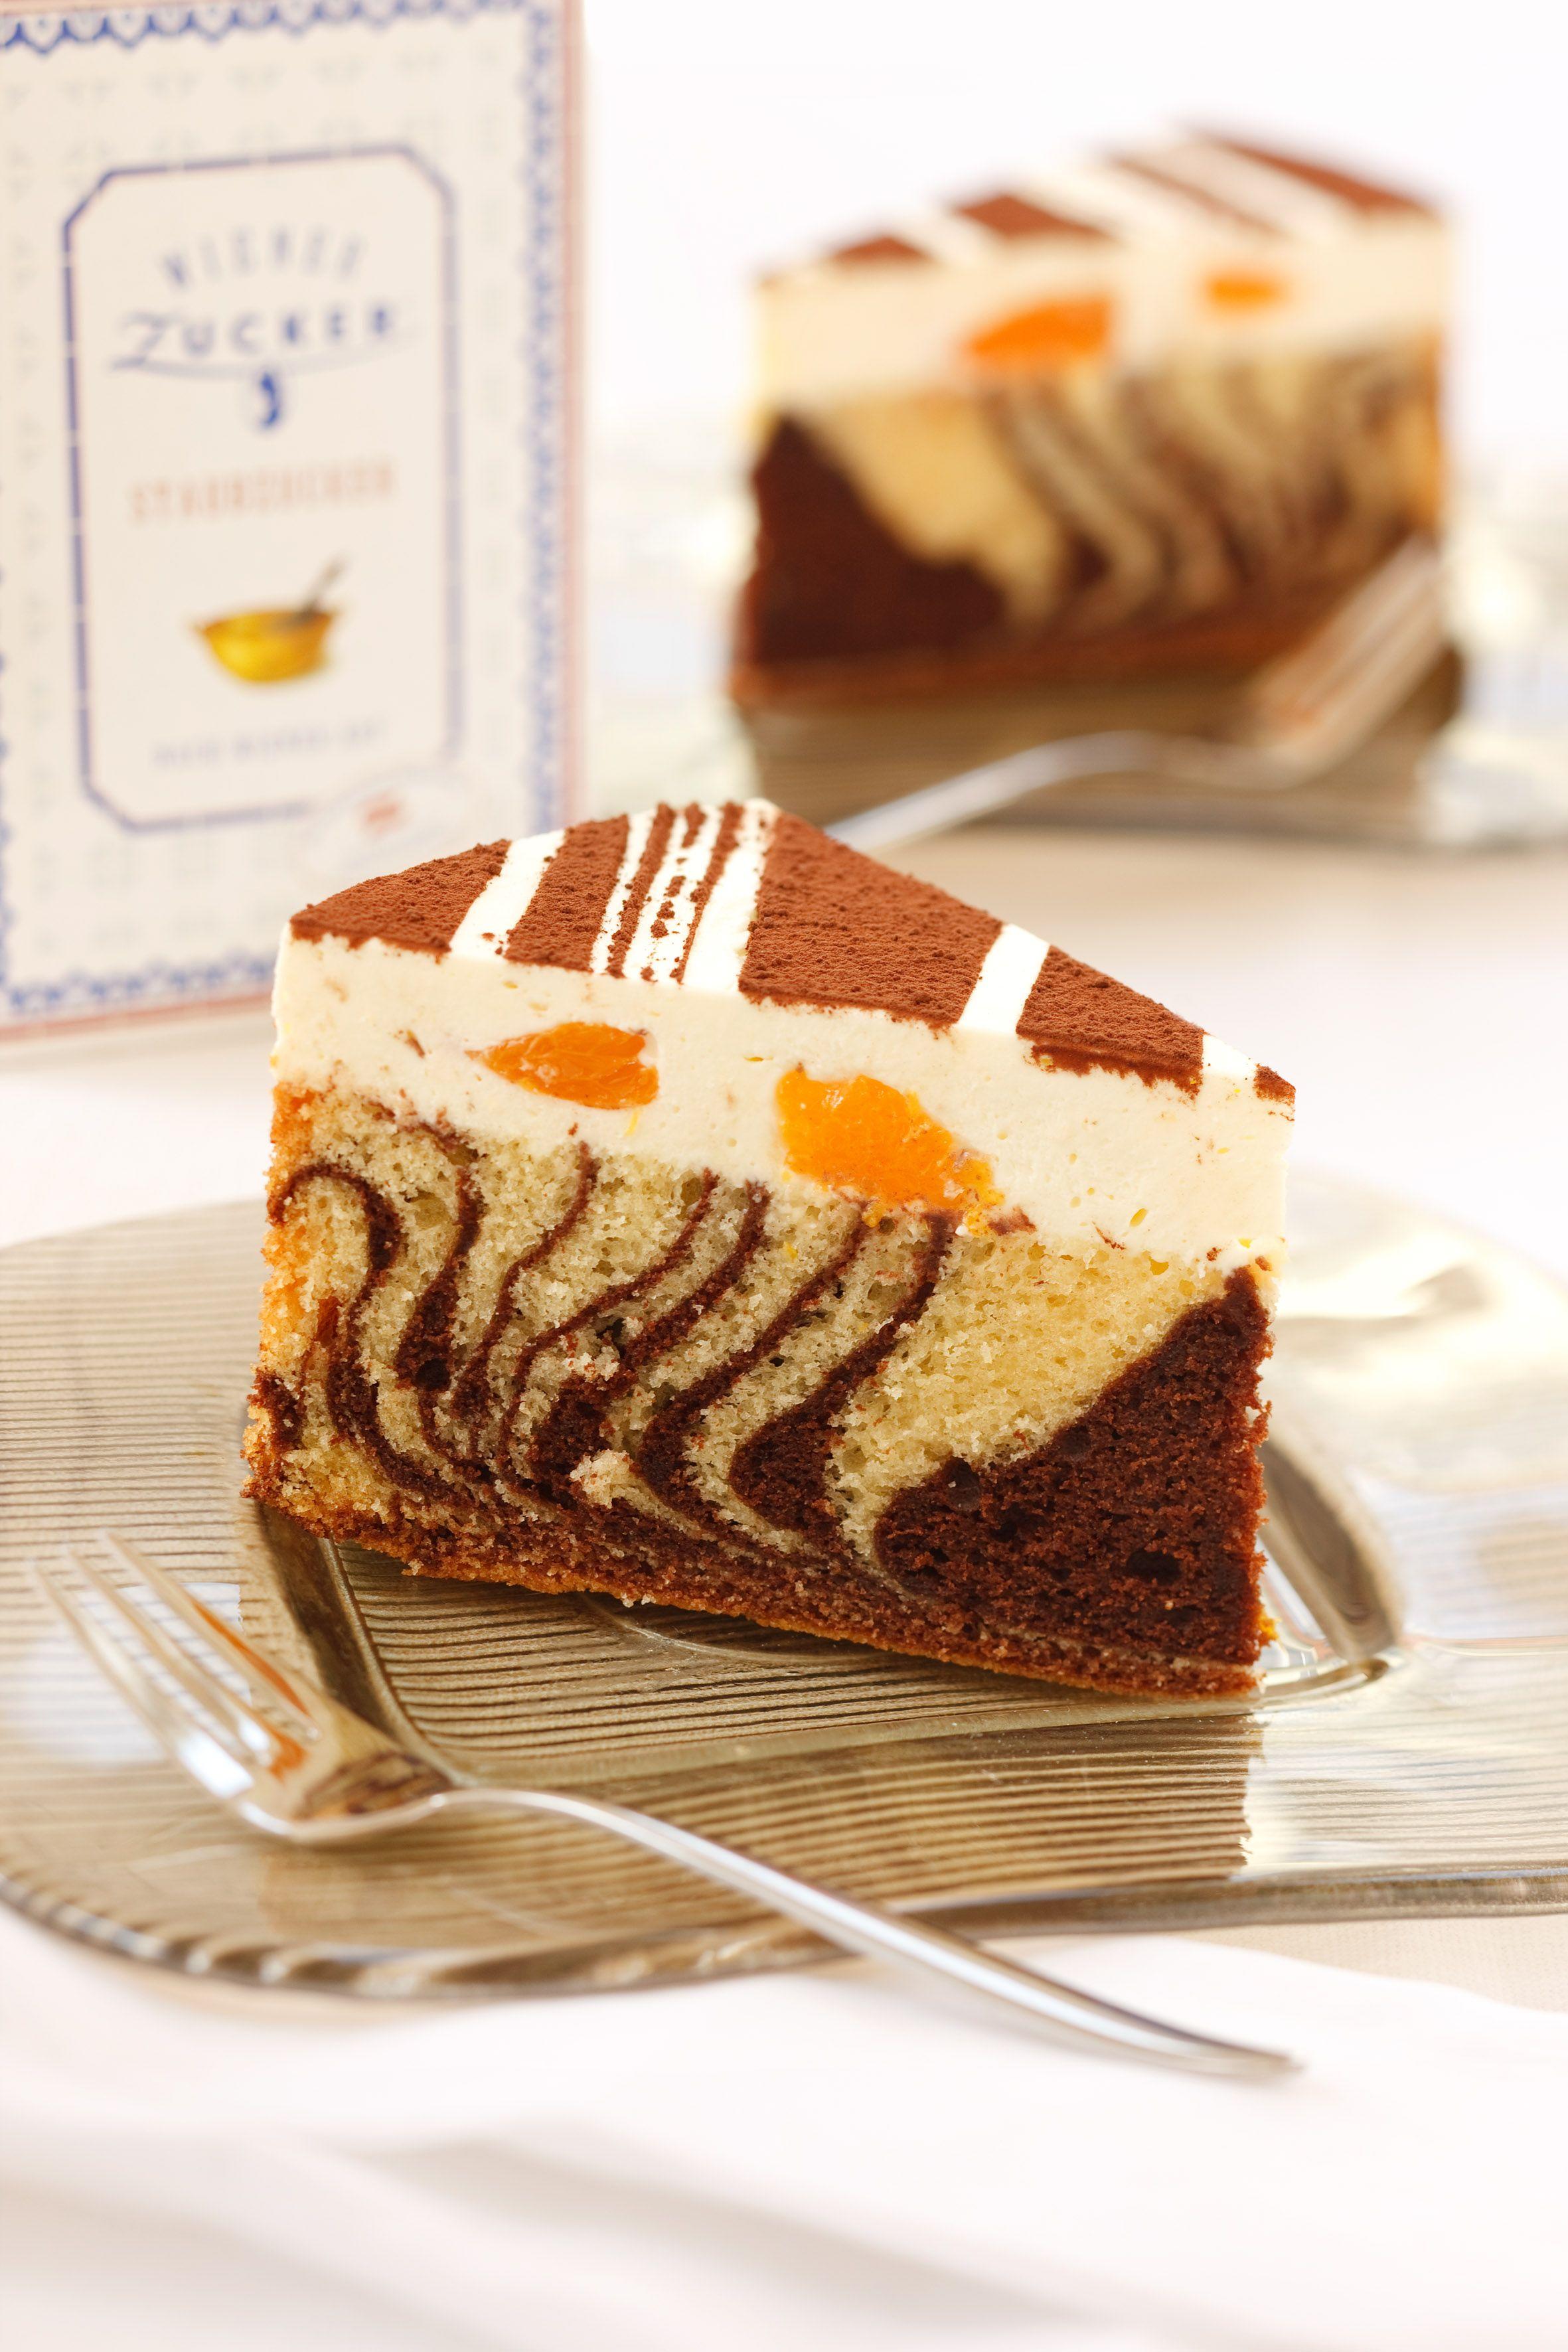 Zebratorte Rezept Backen Kuchen Torte Nachspeise Mandarinen